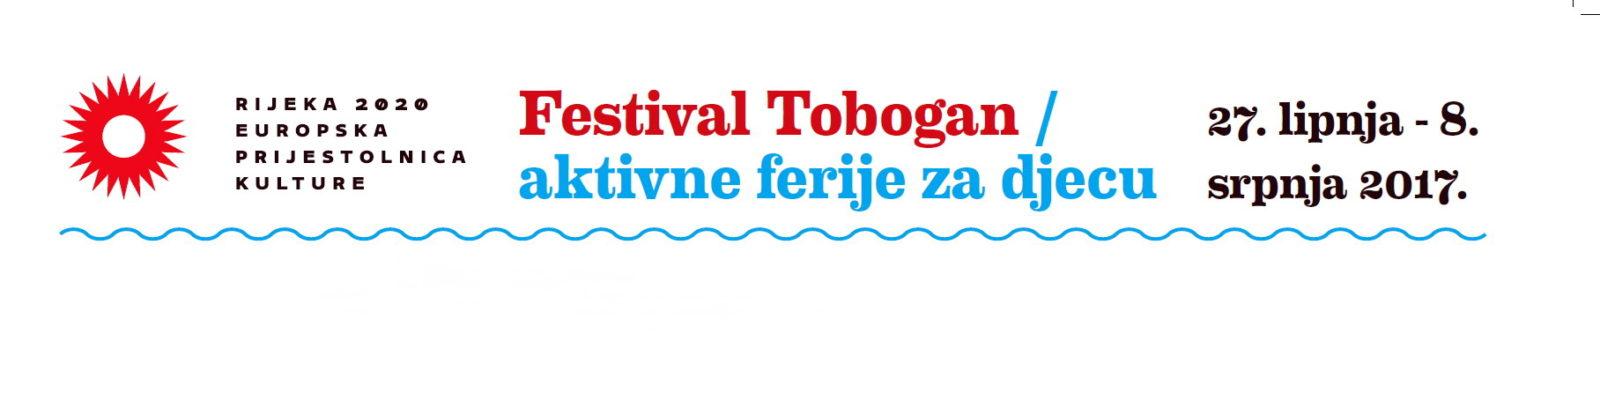 Festival tobogan